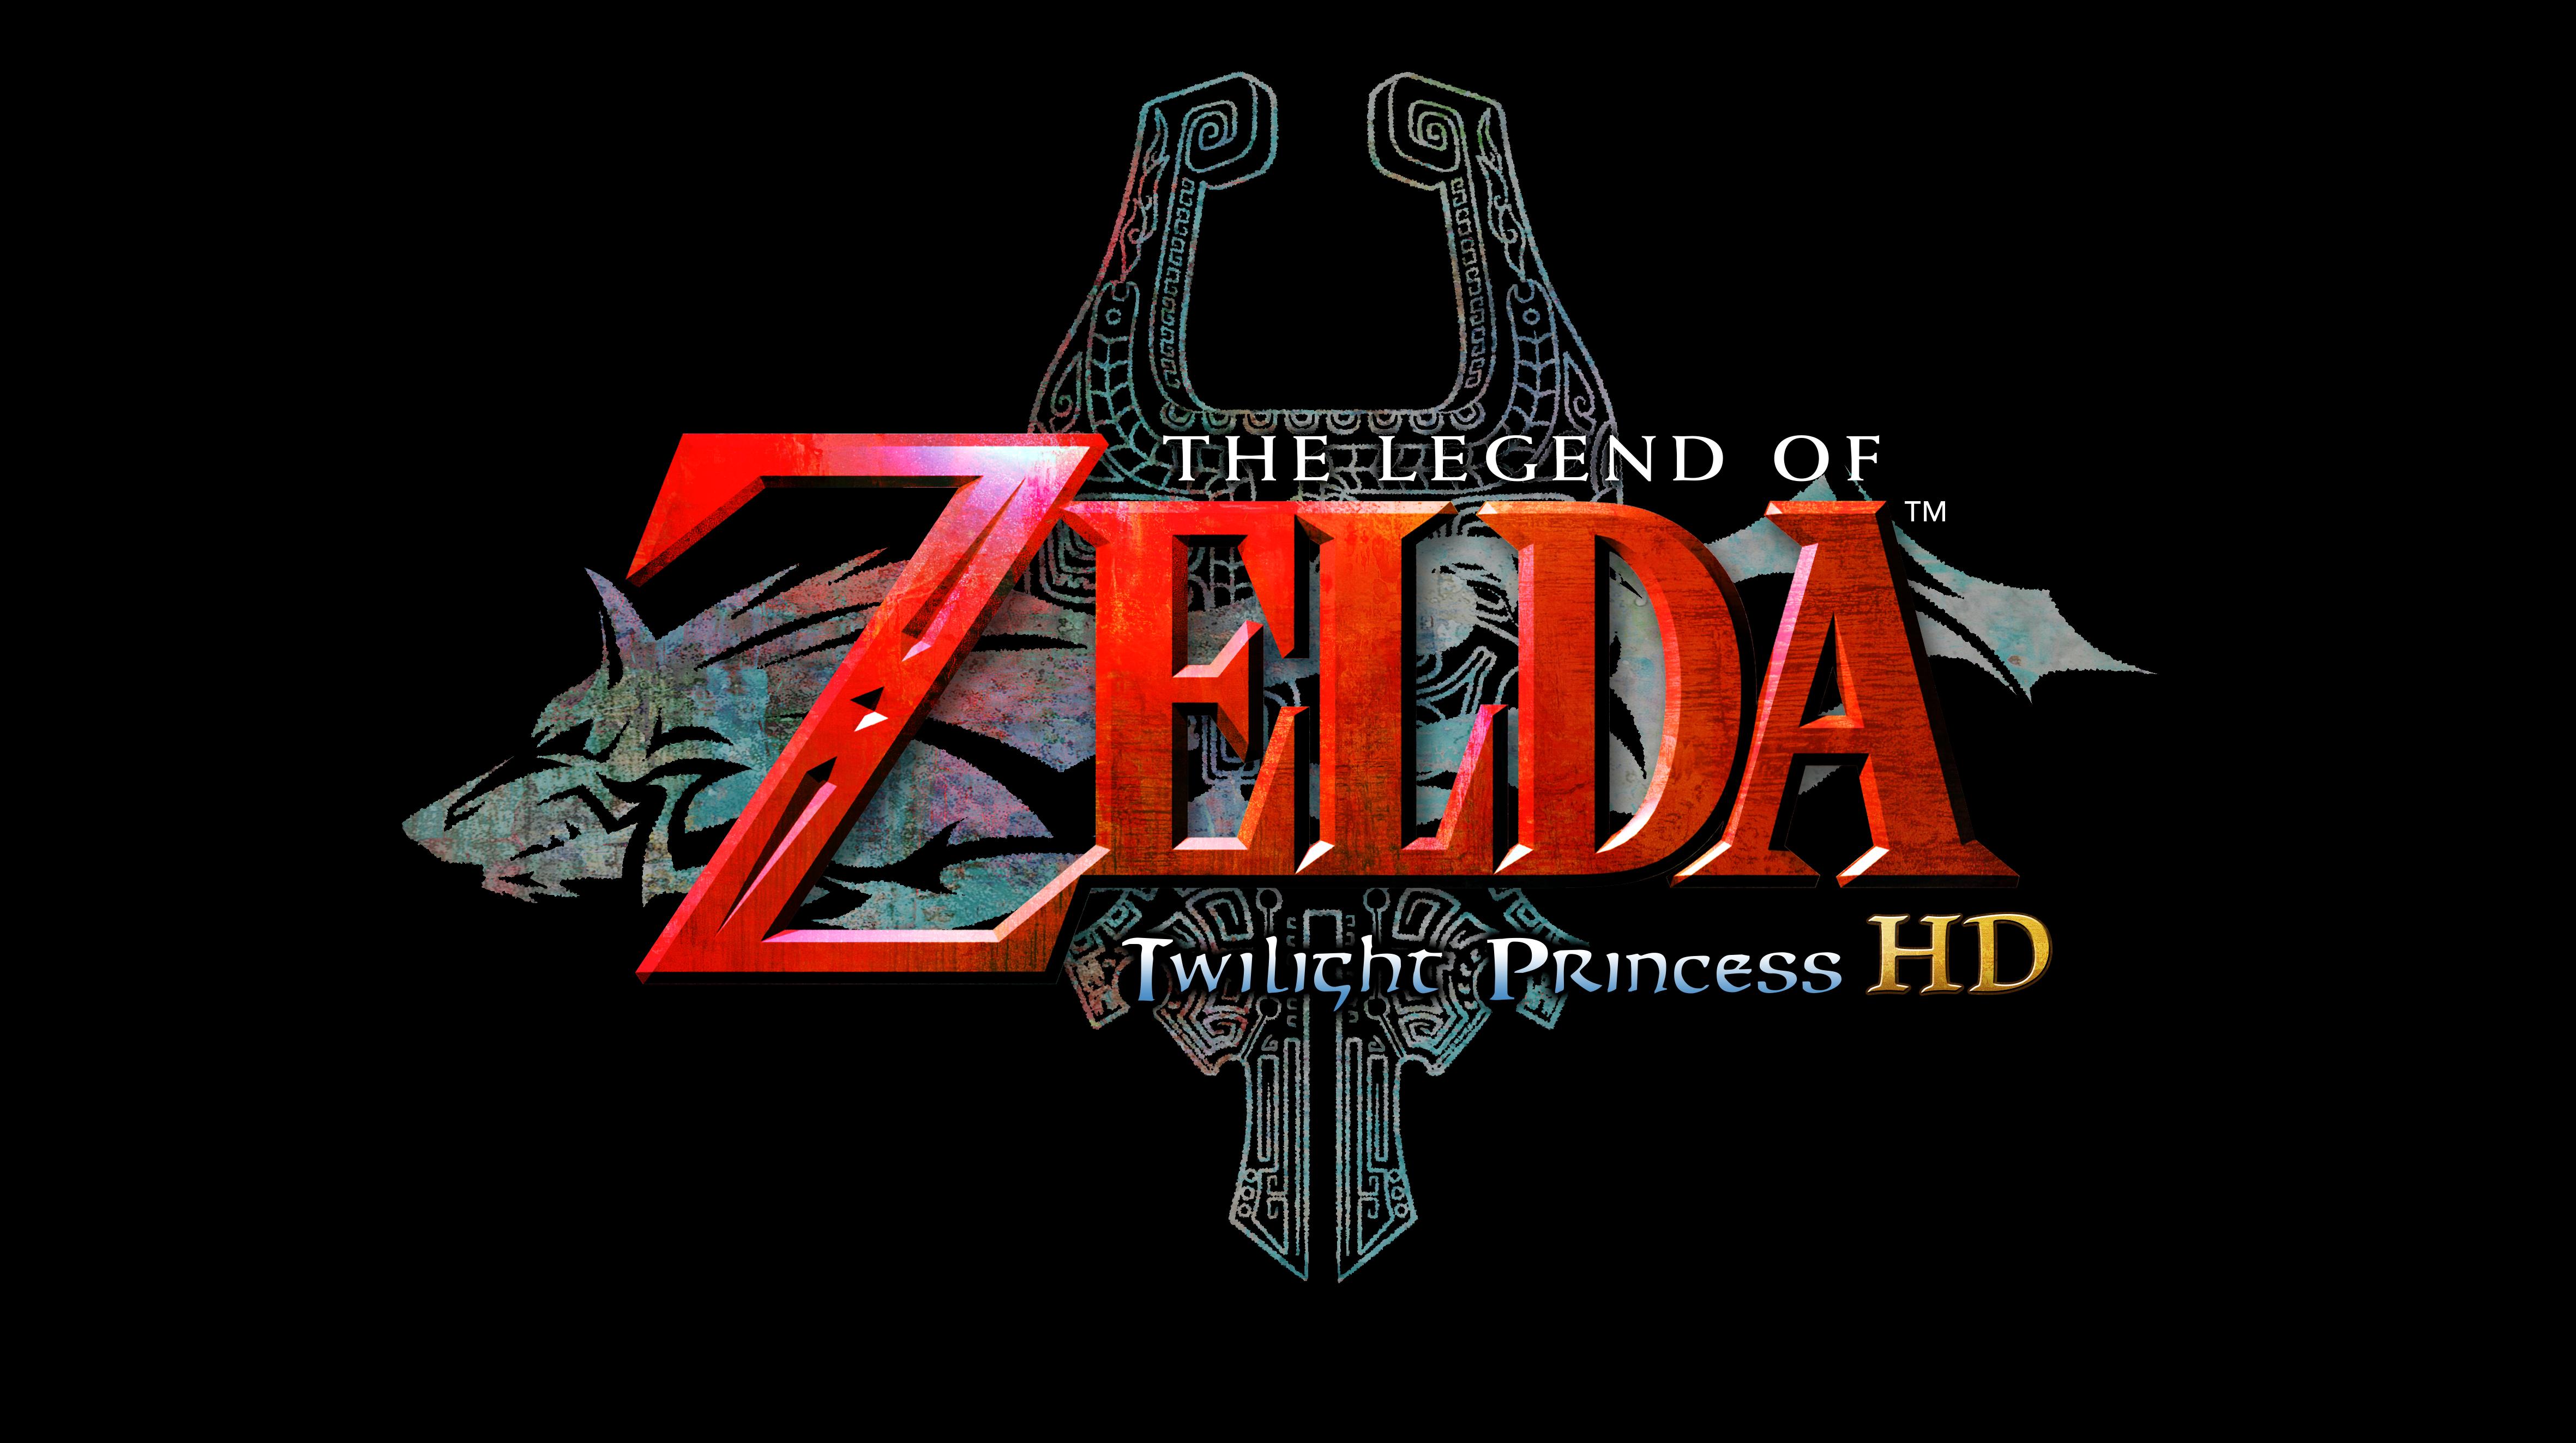 Twilight princess release date in Australia